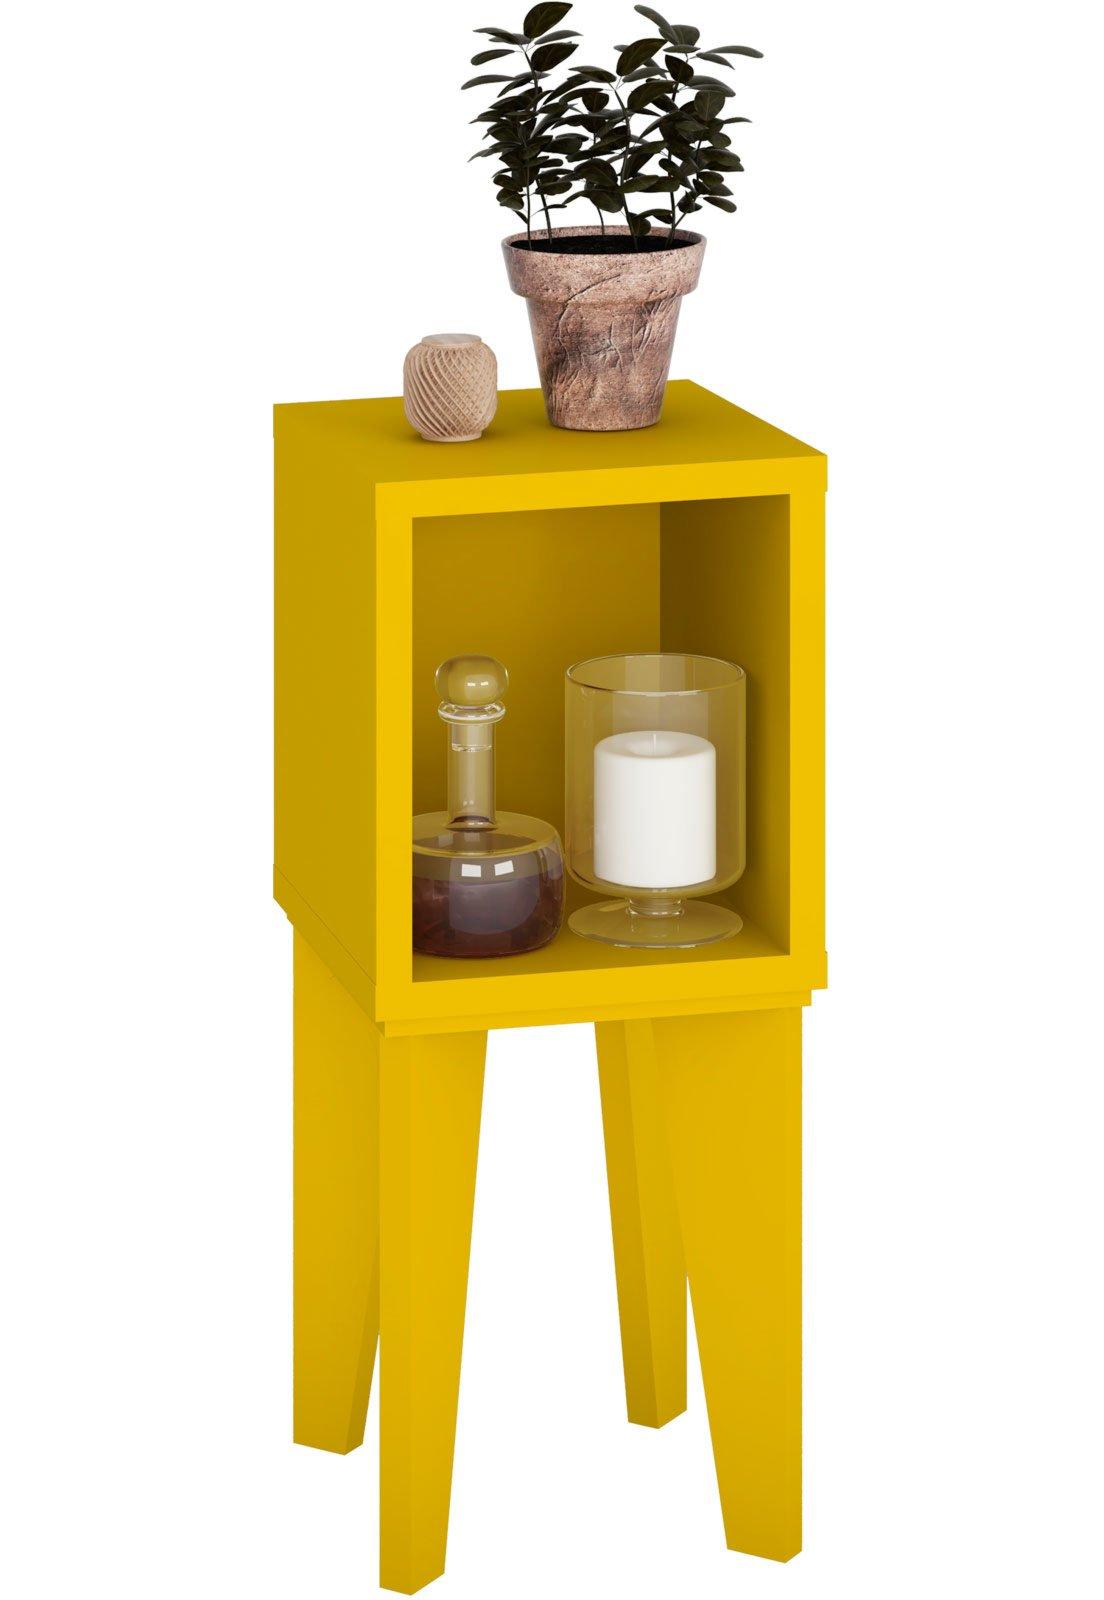 Image of: Mesa De Canto Tubi Rv Moveis Amarelo Compre Agora Dafiti Brasil